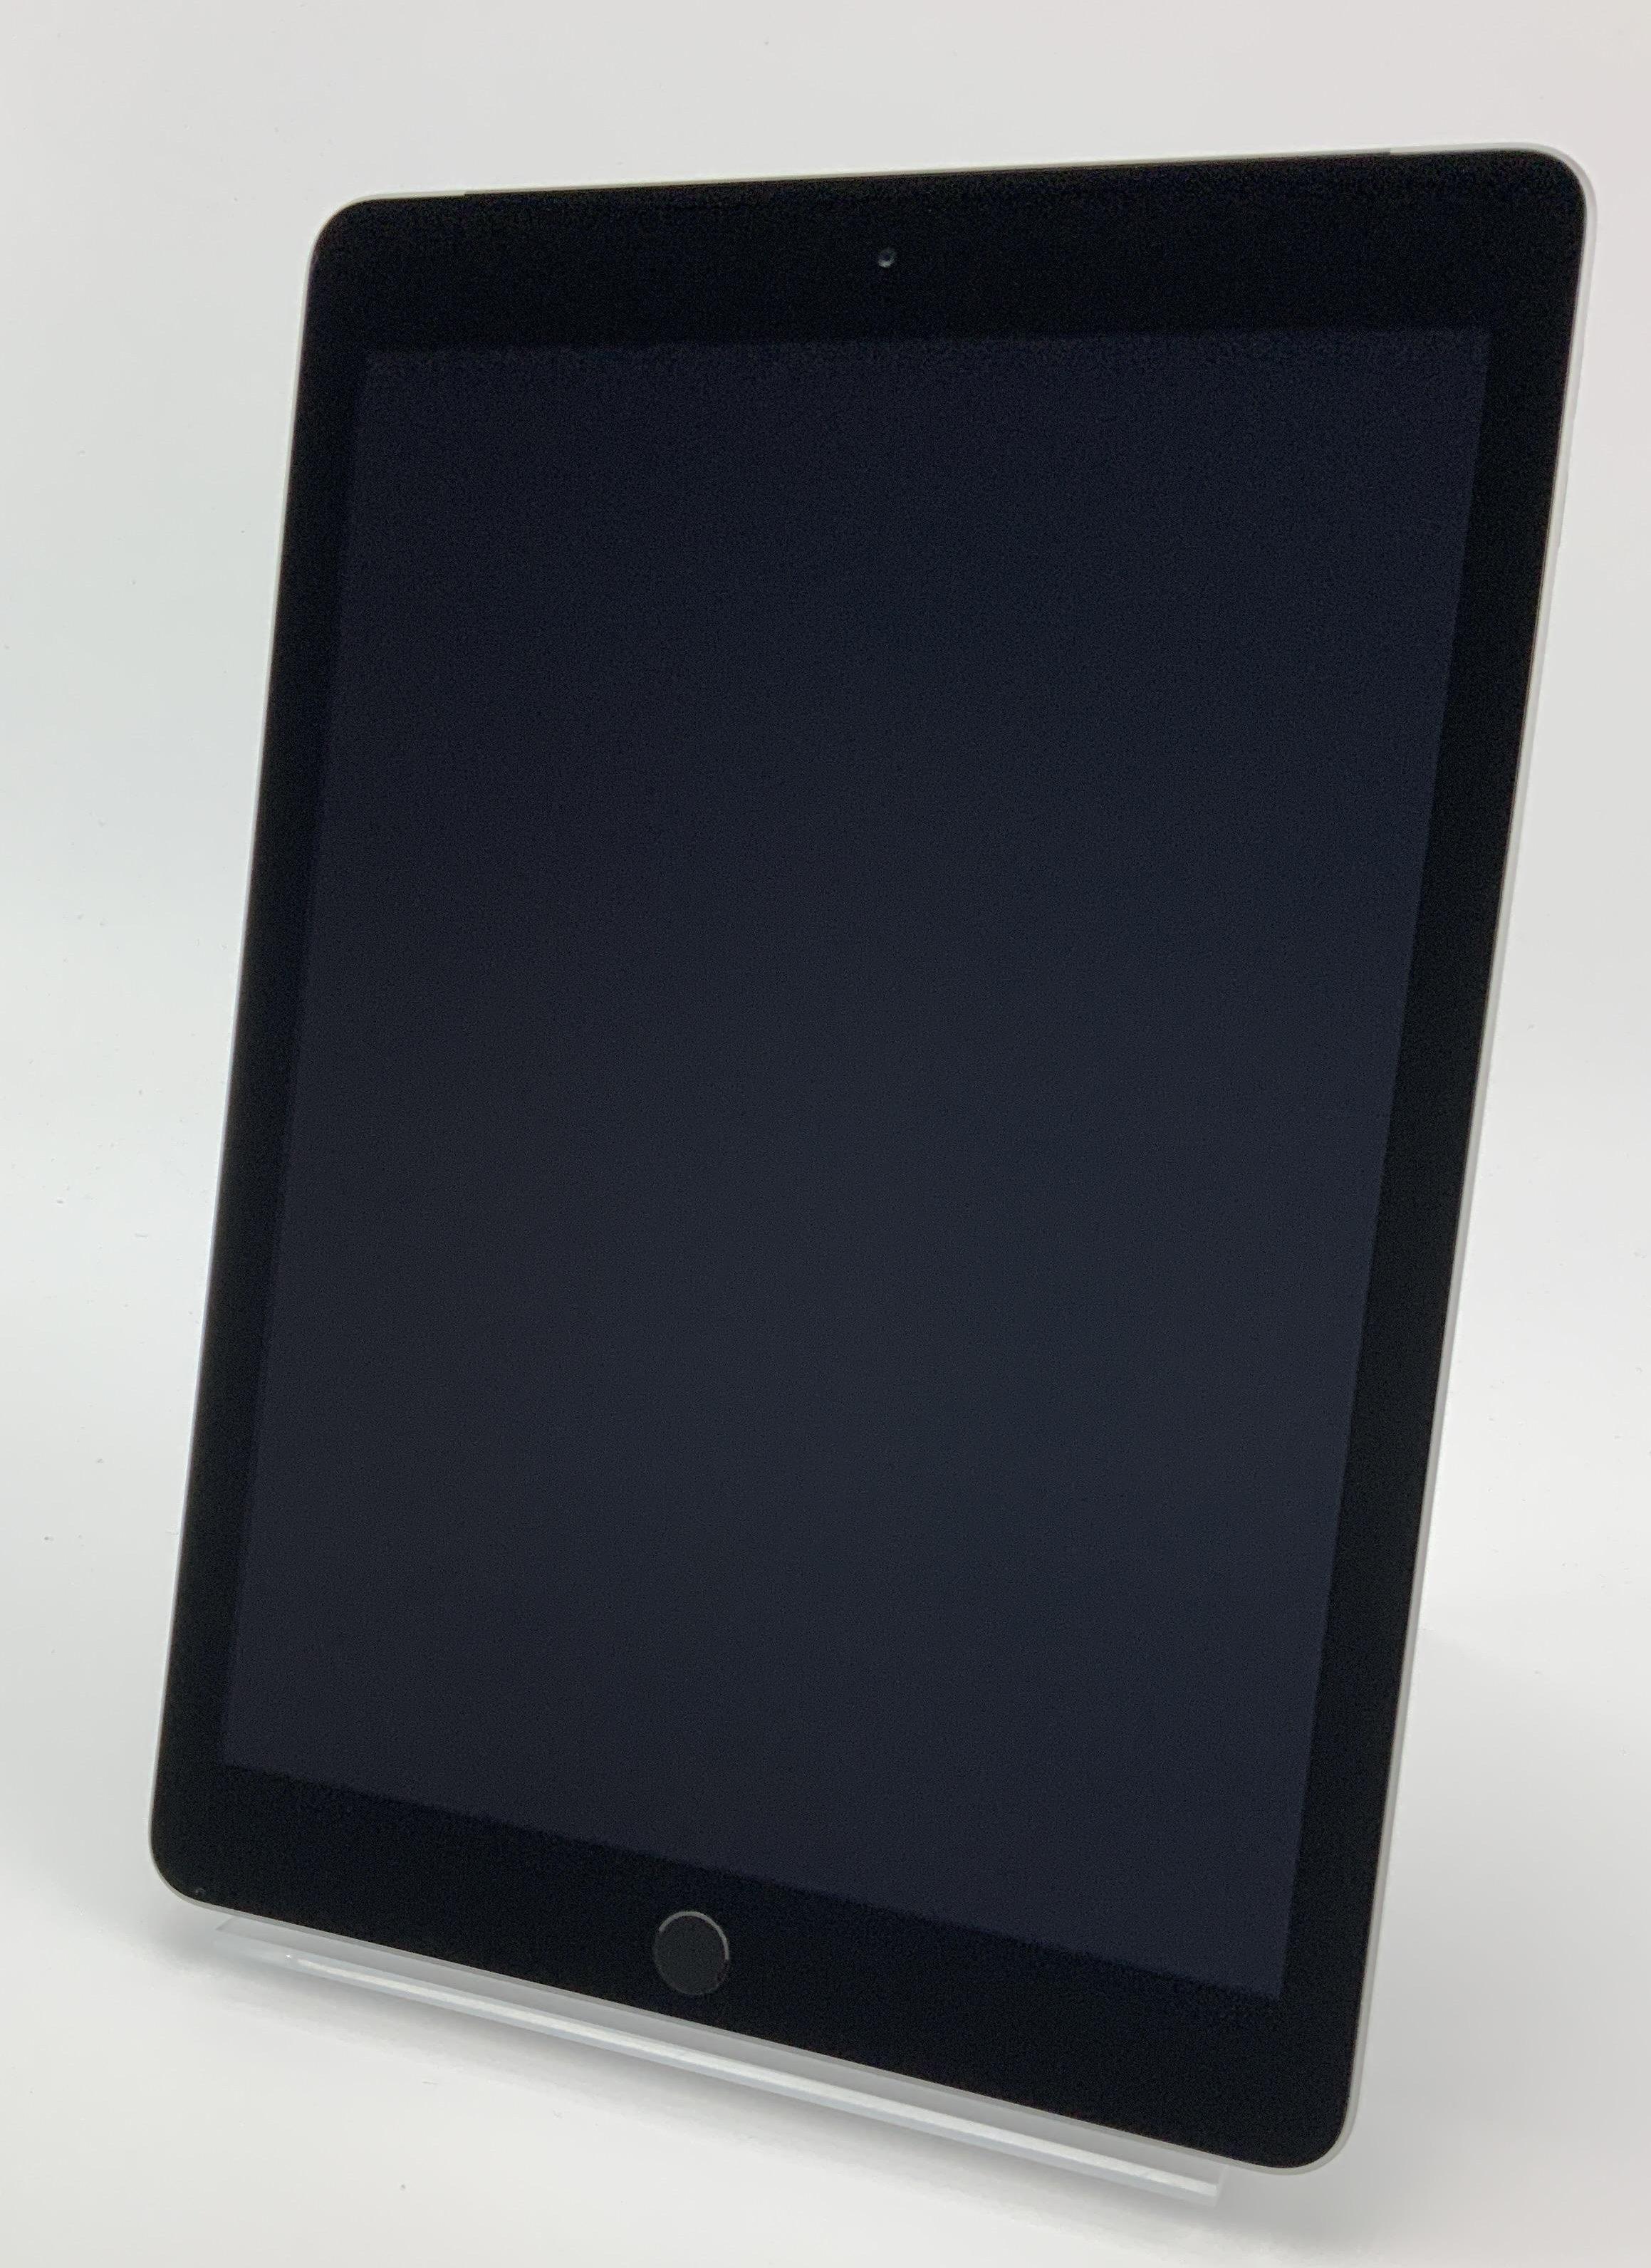 iPad 5 Wi-Fi + Cellular 32GB, 32GB, Space Gray, obraz 1